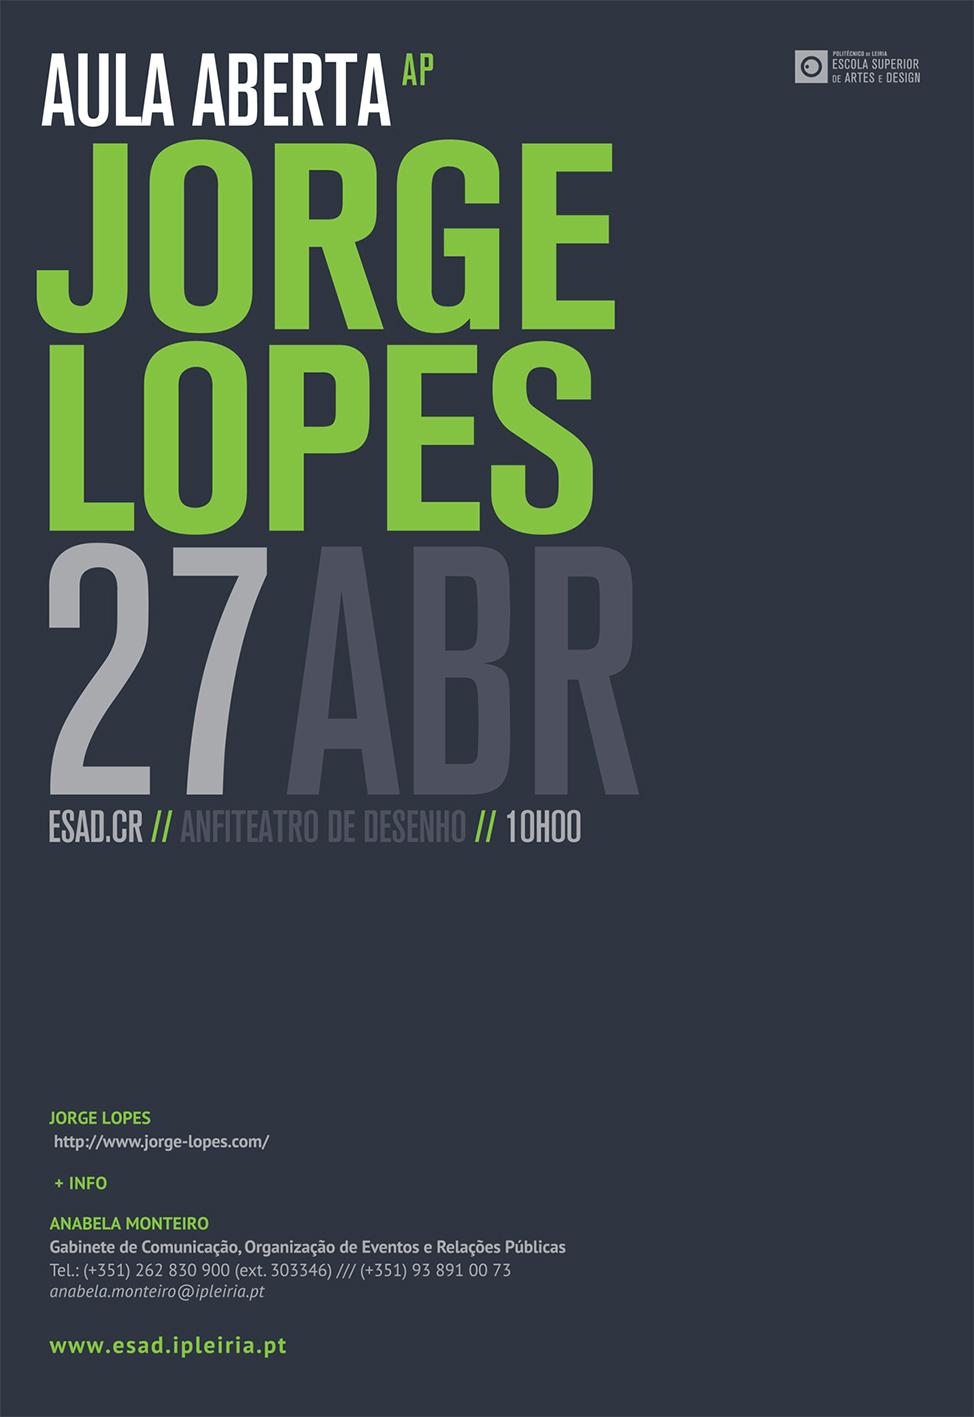 jorge-lopes_aula-aberta